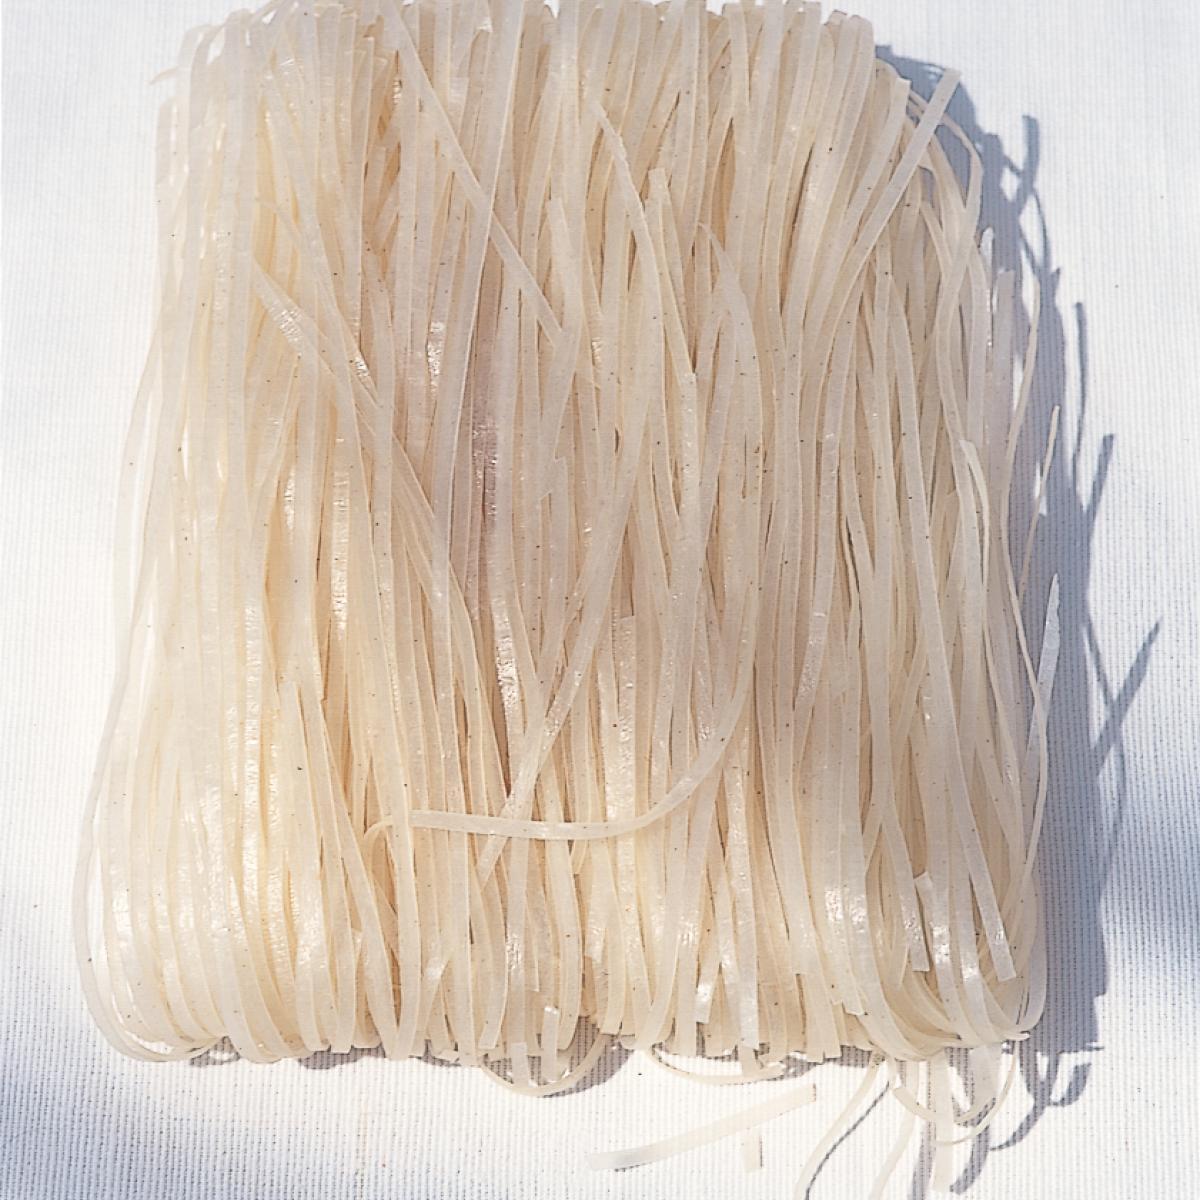 Ingredient htc noodles